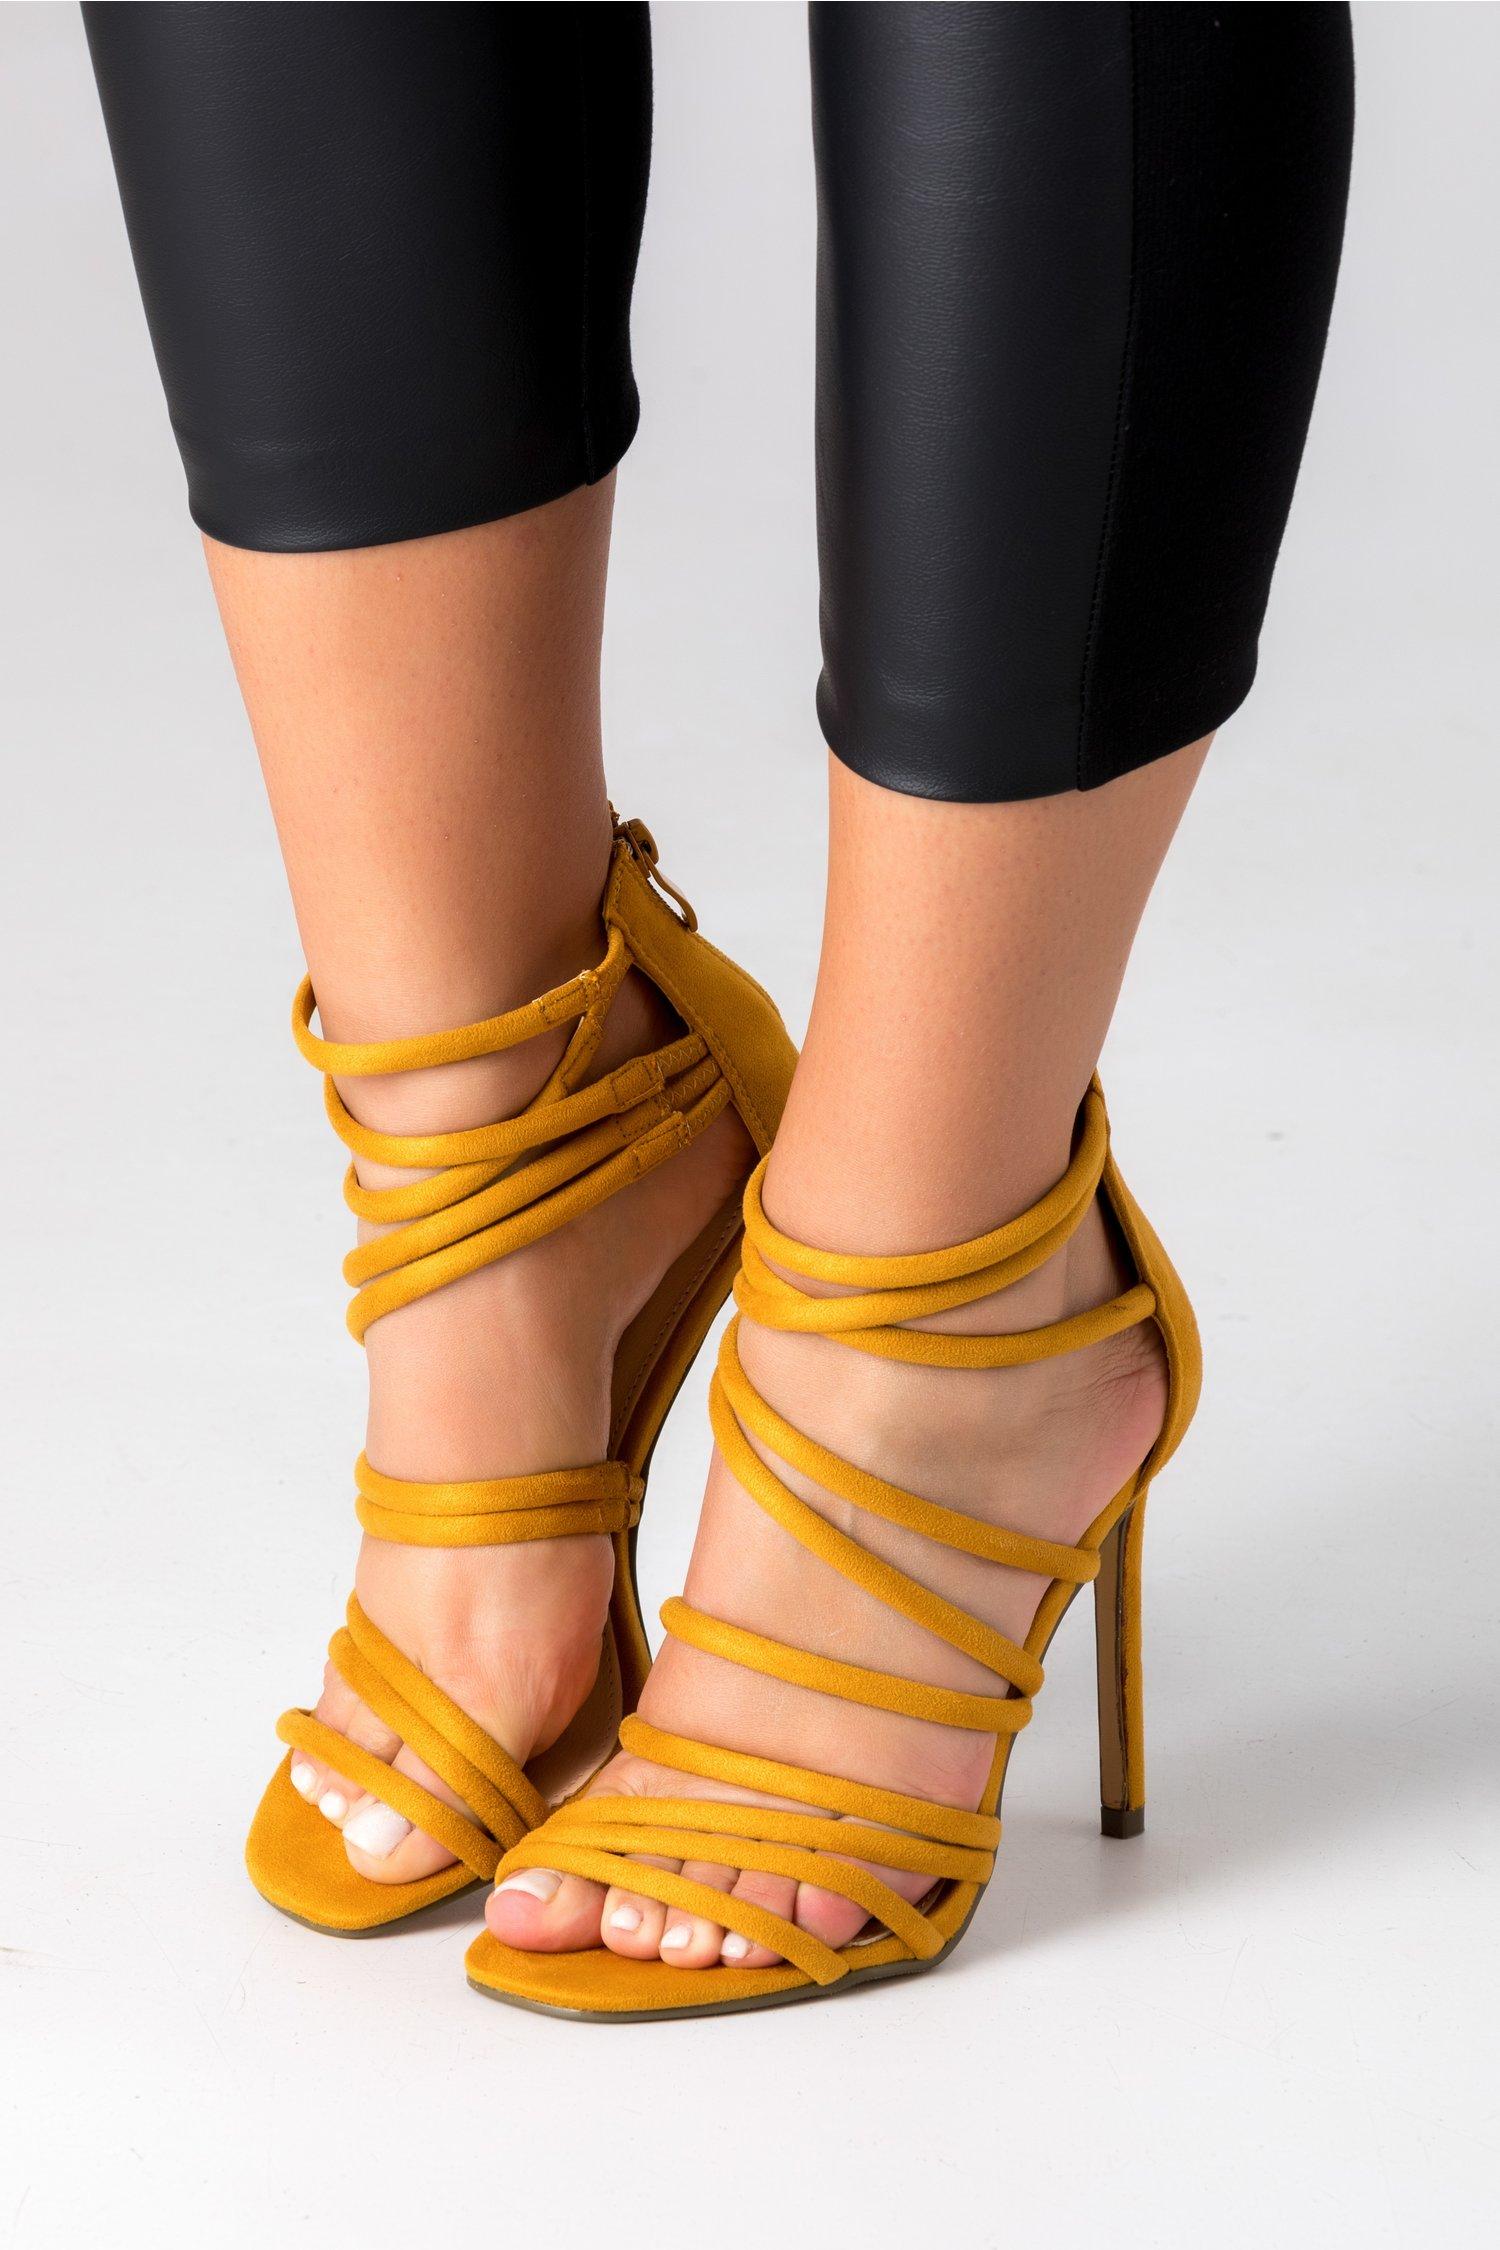 Sandale Anny galben mustar elegante